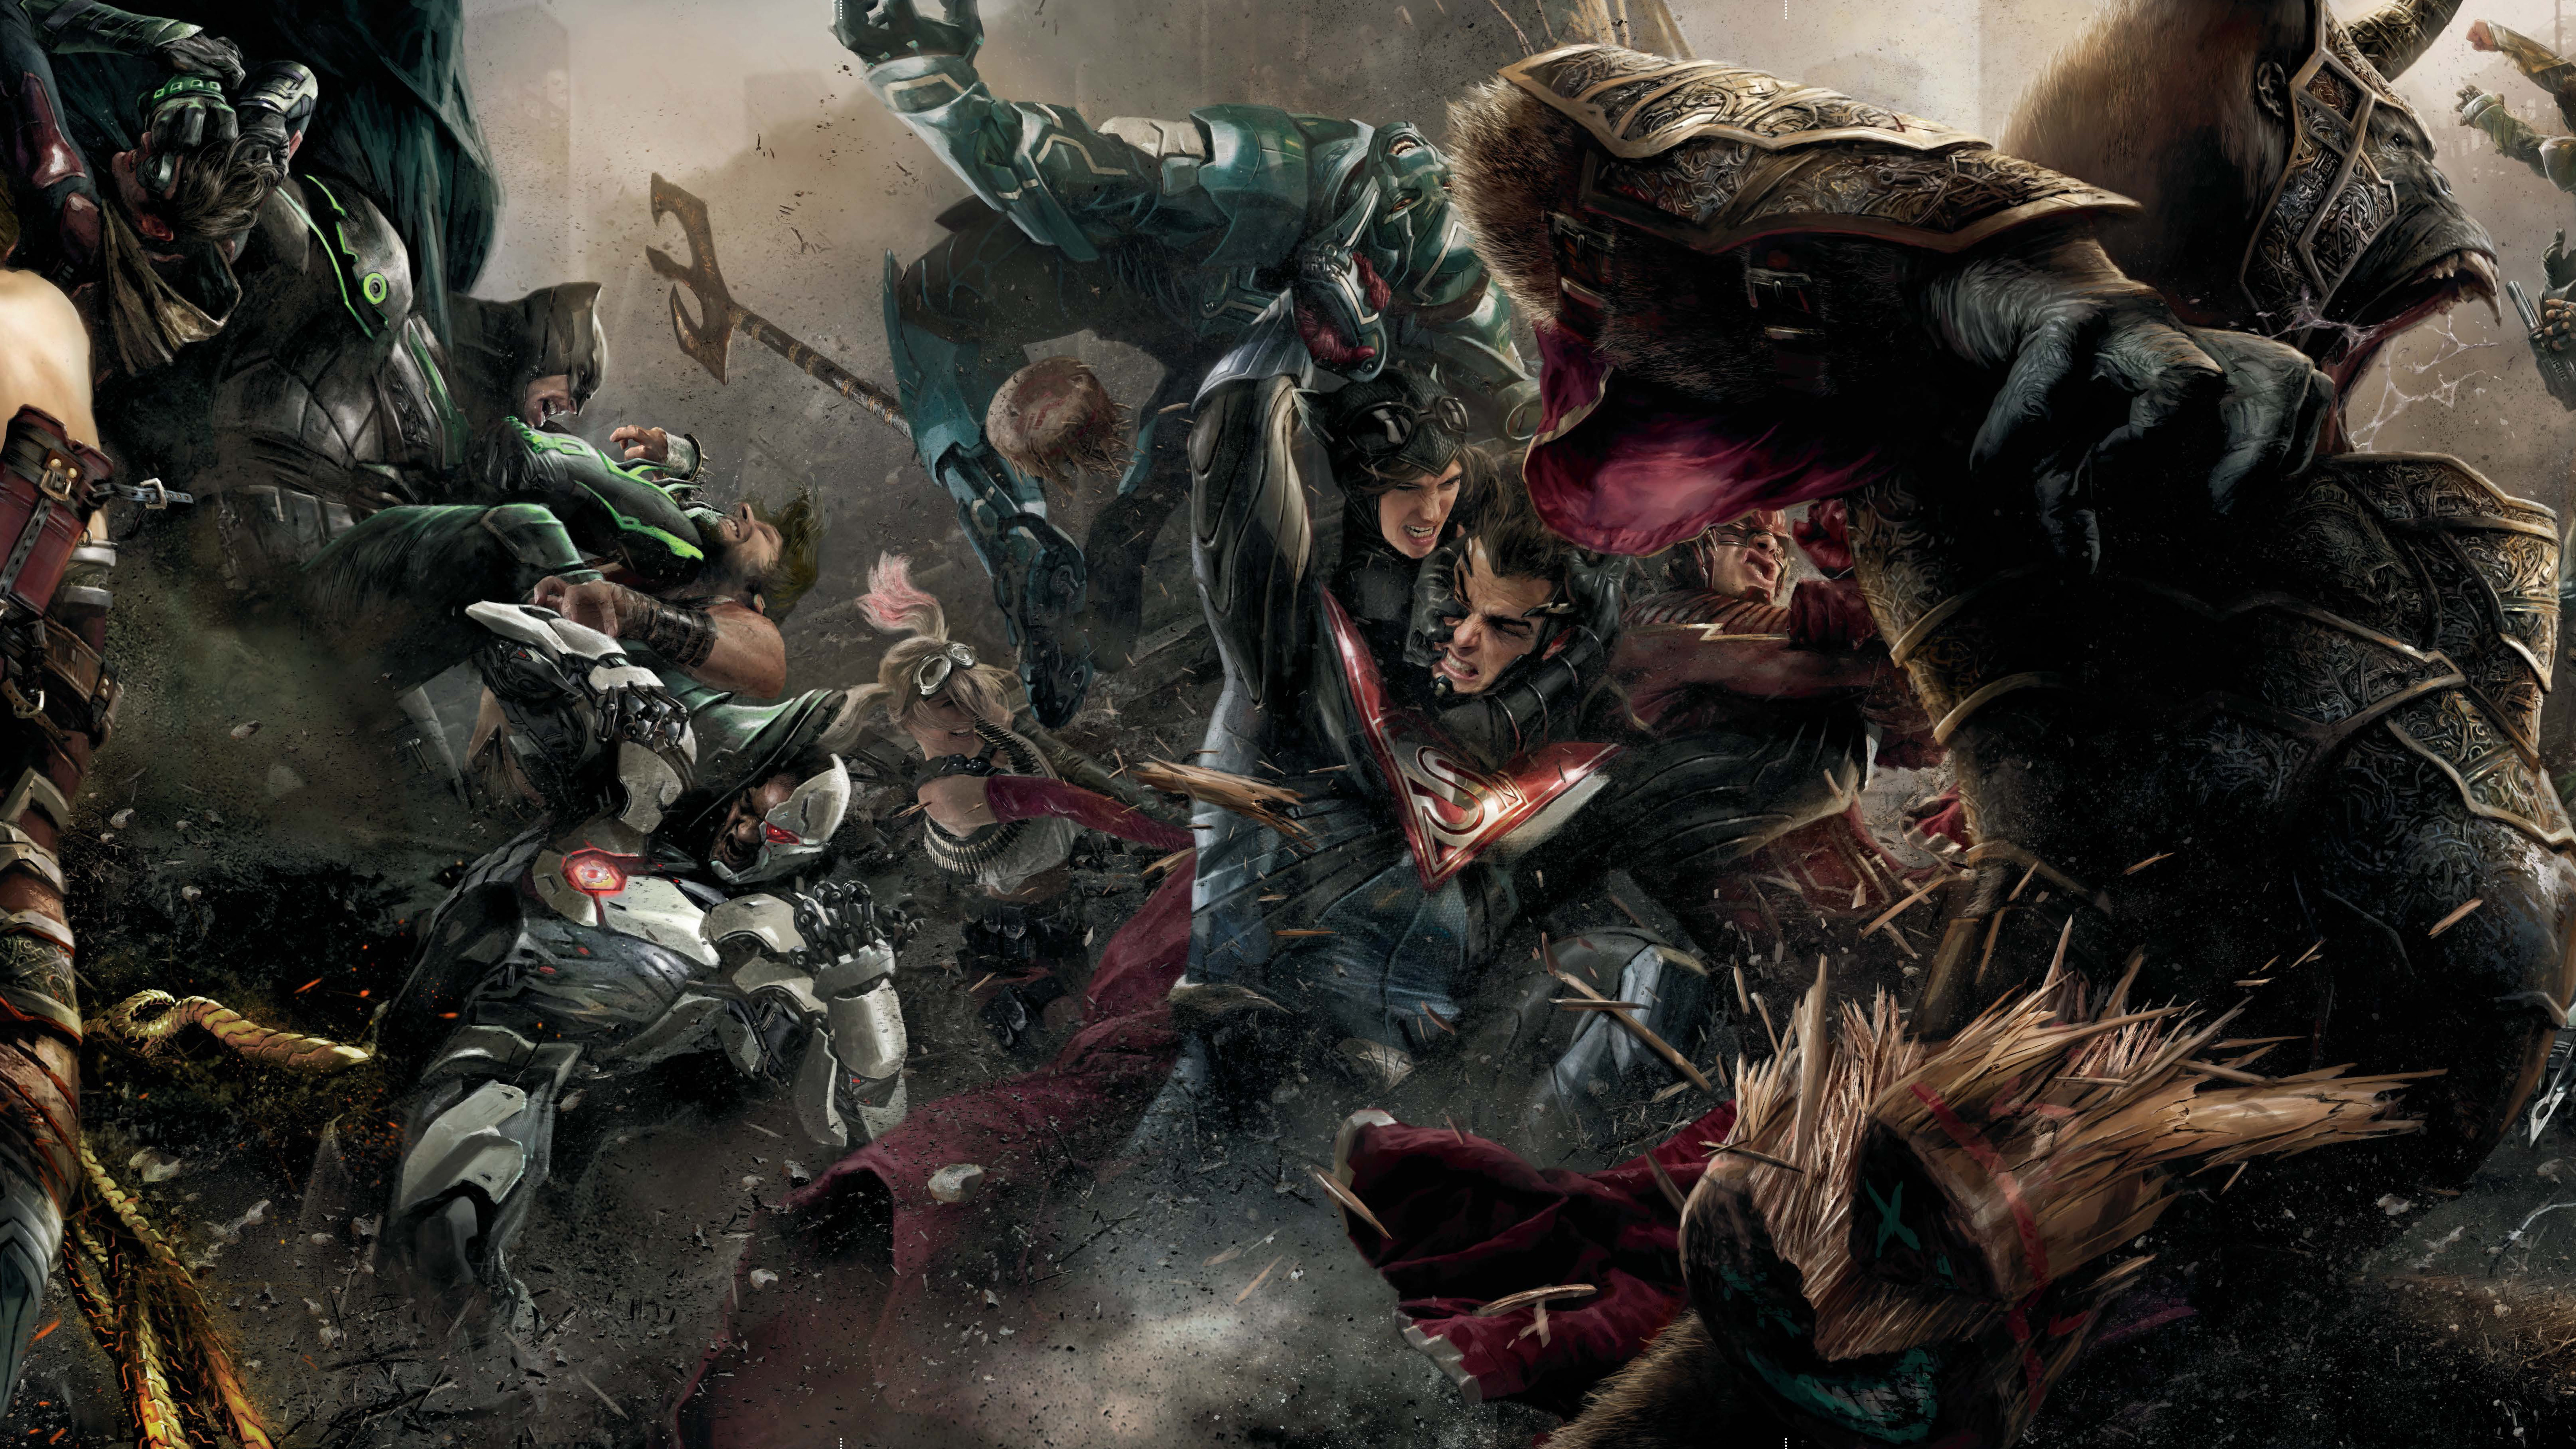 Wallpaper Of Video Game, Dc, Injustice, Injustice 2 - Injustice 2 Shattered Alliances - HD Wallpaper